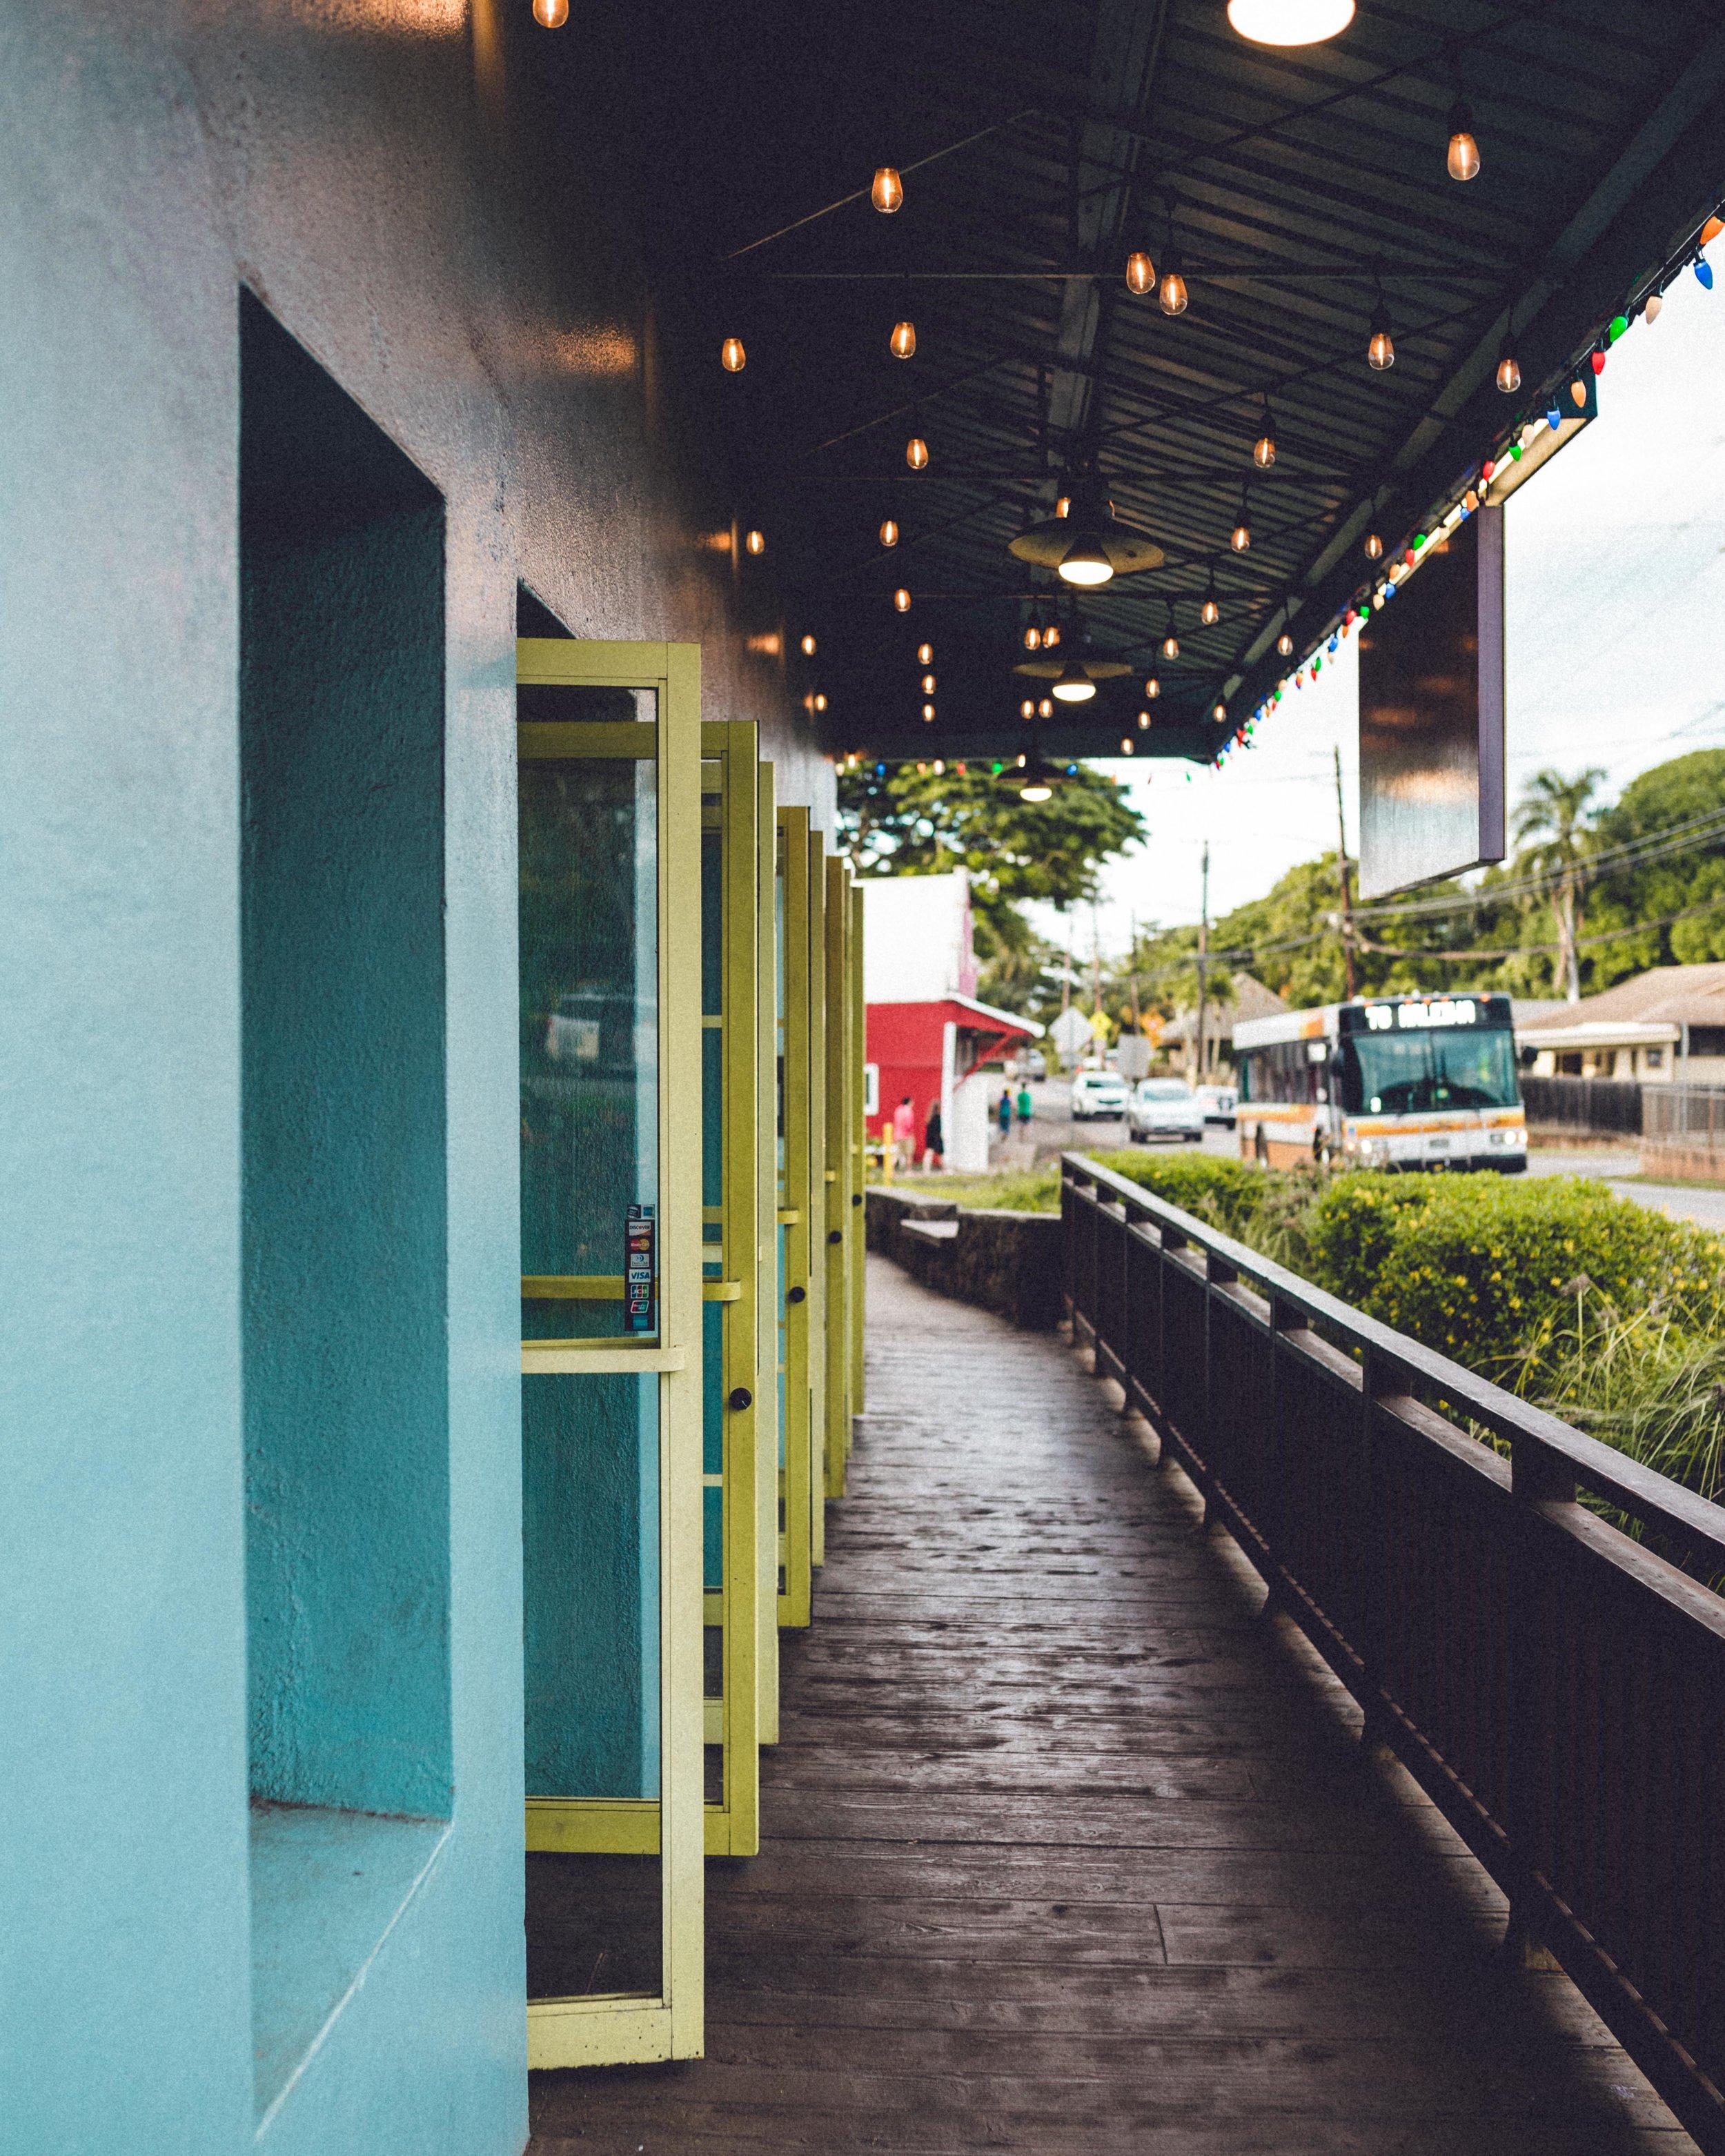 Rachel Off Duty: Shopping in North Shore Oahu